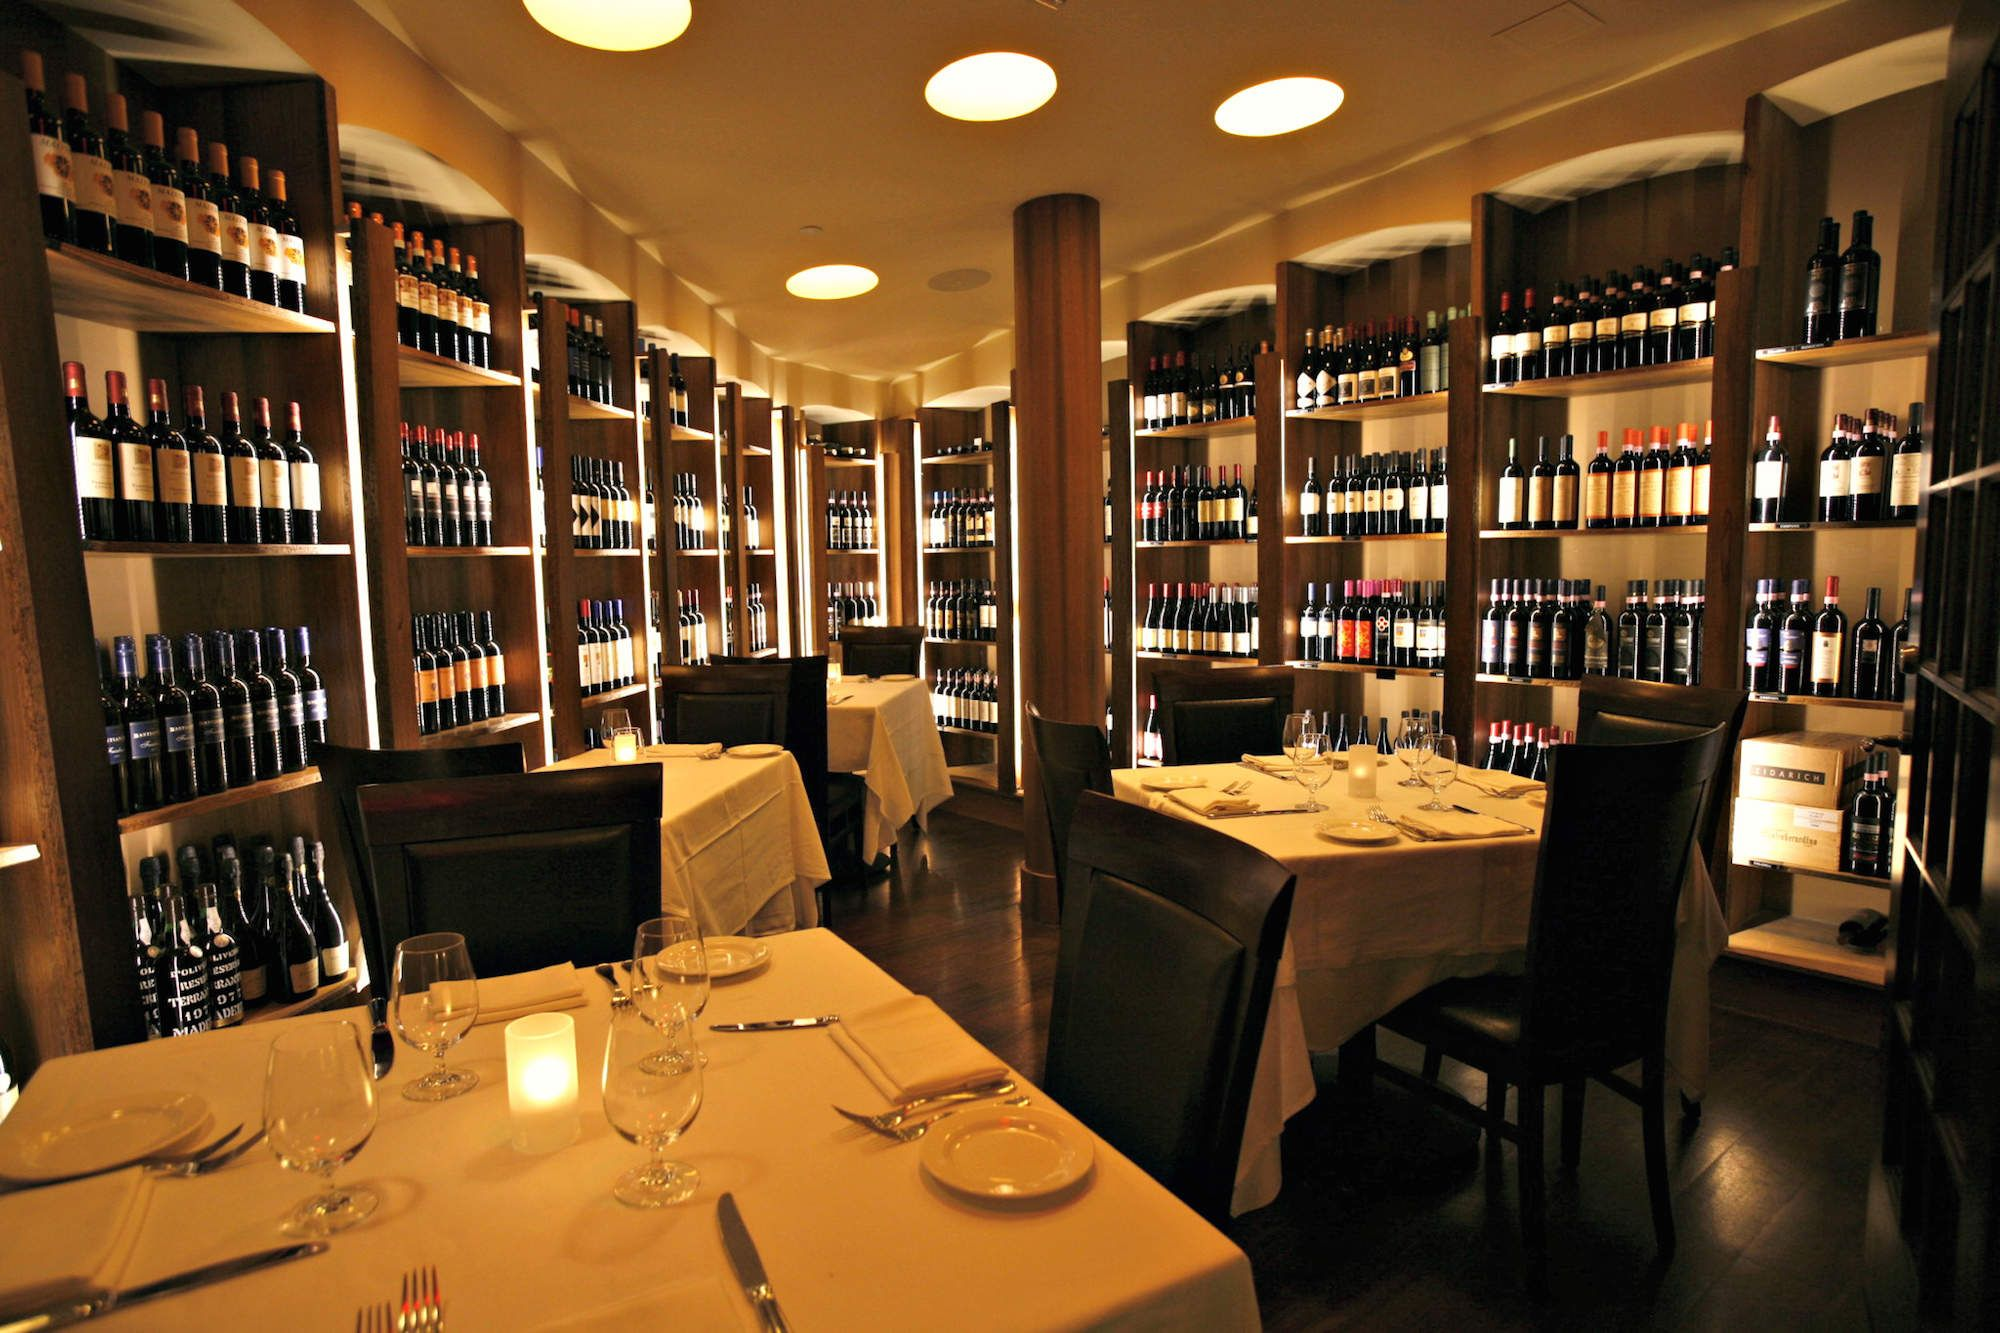 The 16 Best Italian Restaurants In Las Vegas B Ristorante Lv Lasvegas Travel Party Adventure Like Follow Clubs Traveling Wander